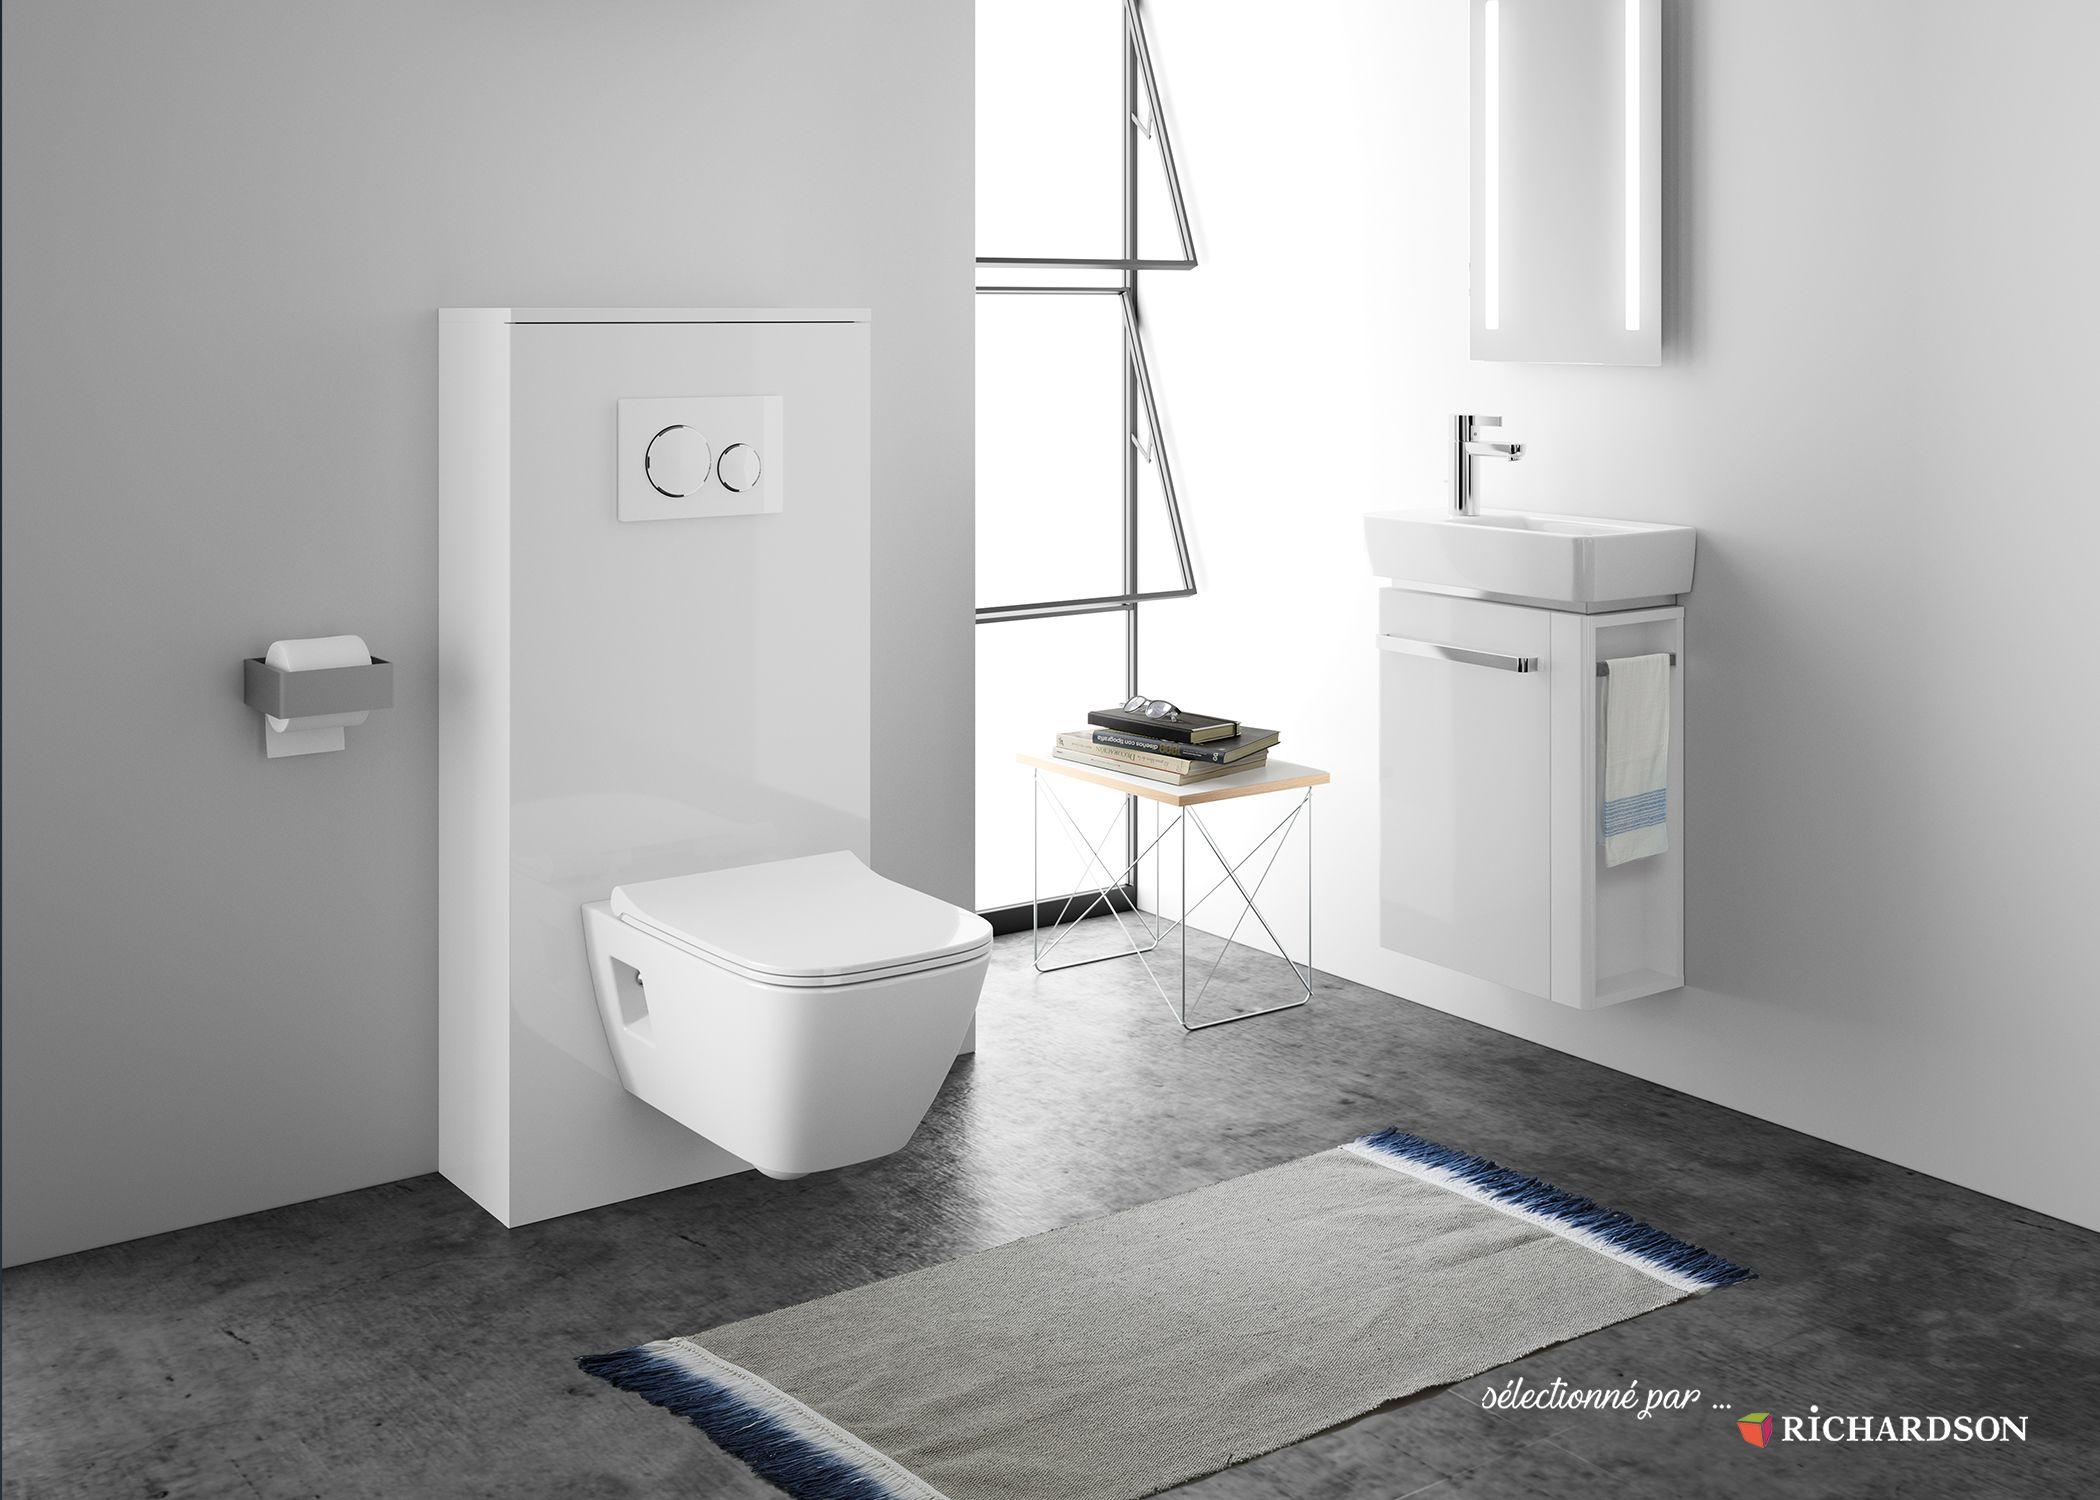 Marque De Toilette Suspendue toilettes suspendus geberit | toilette suspendu geberit